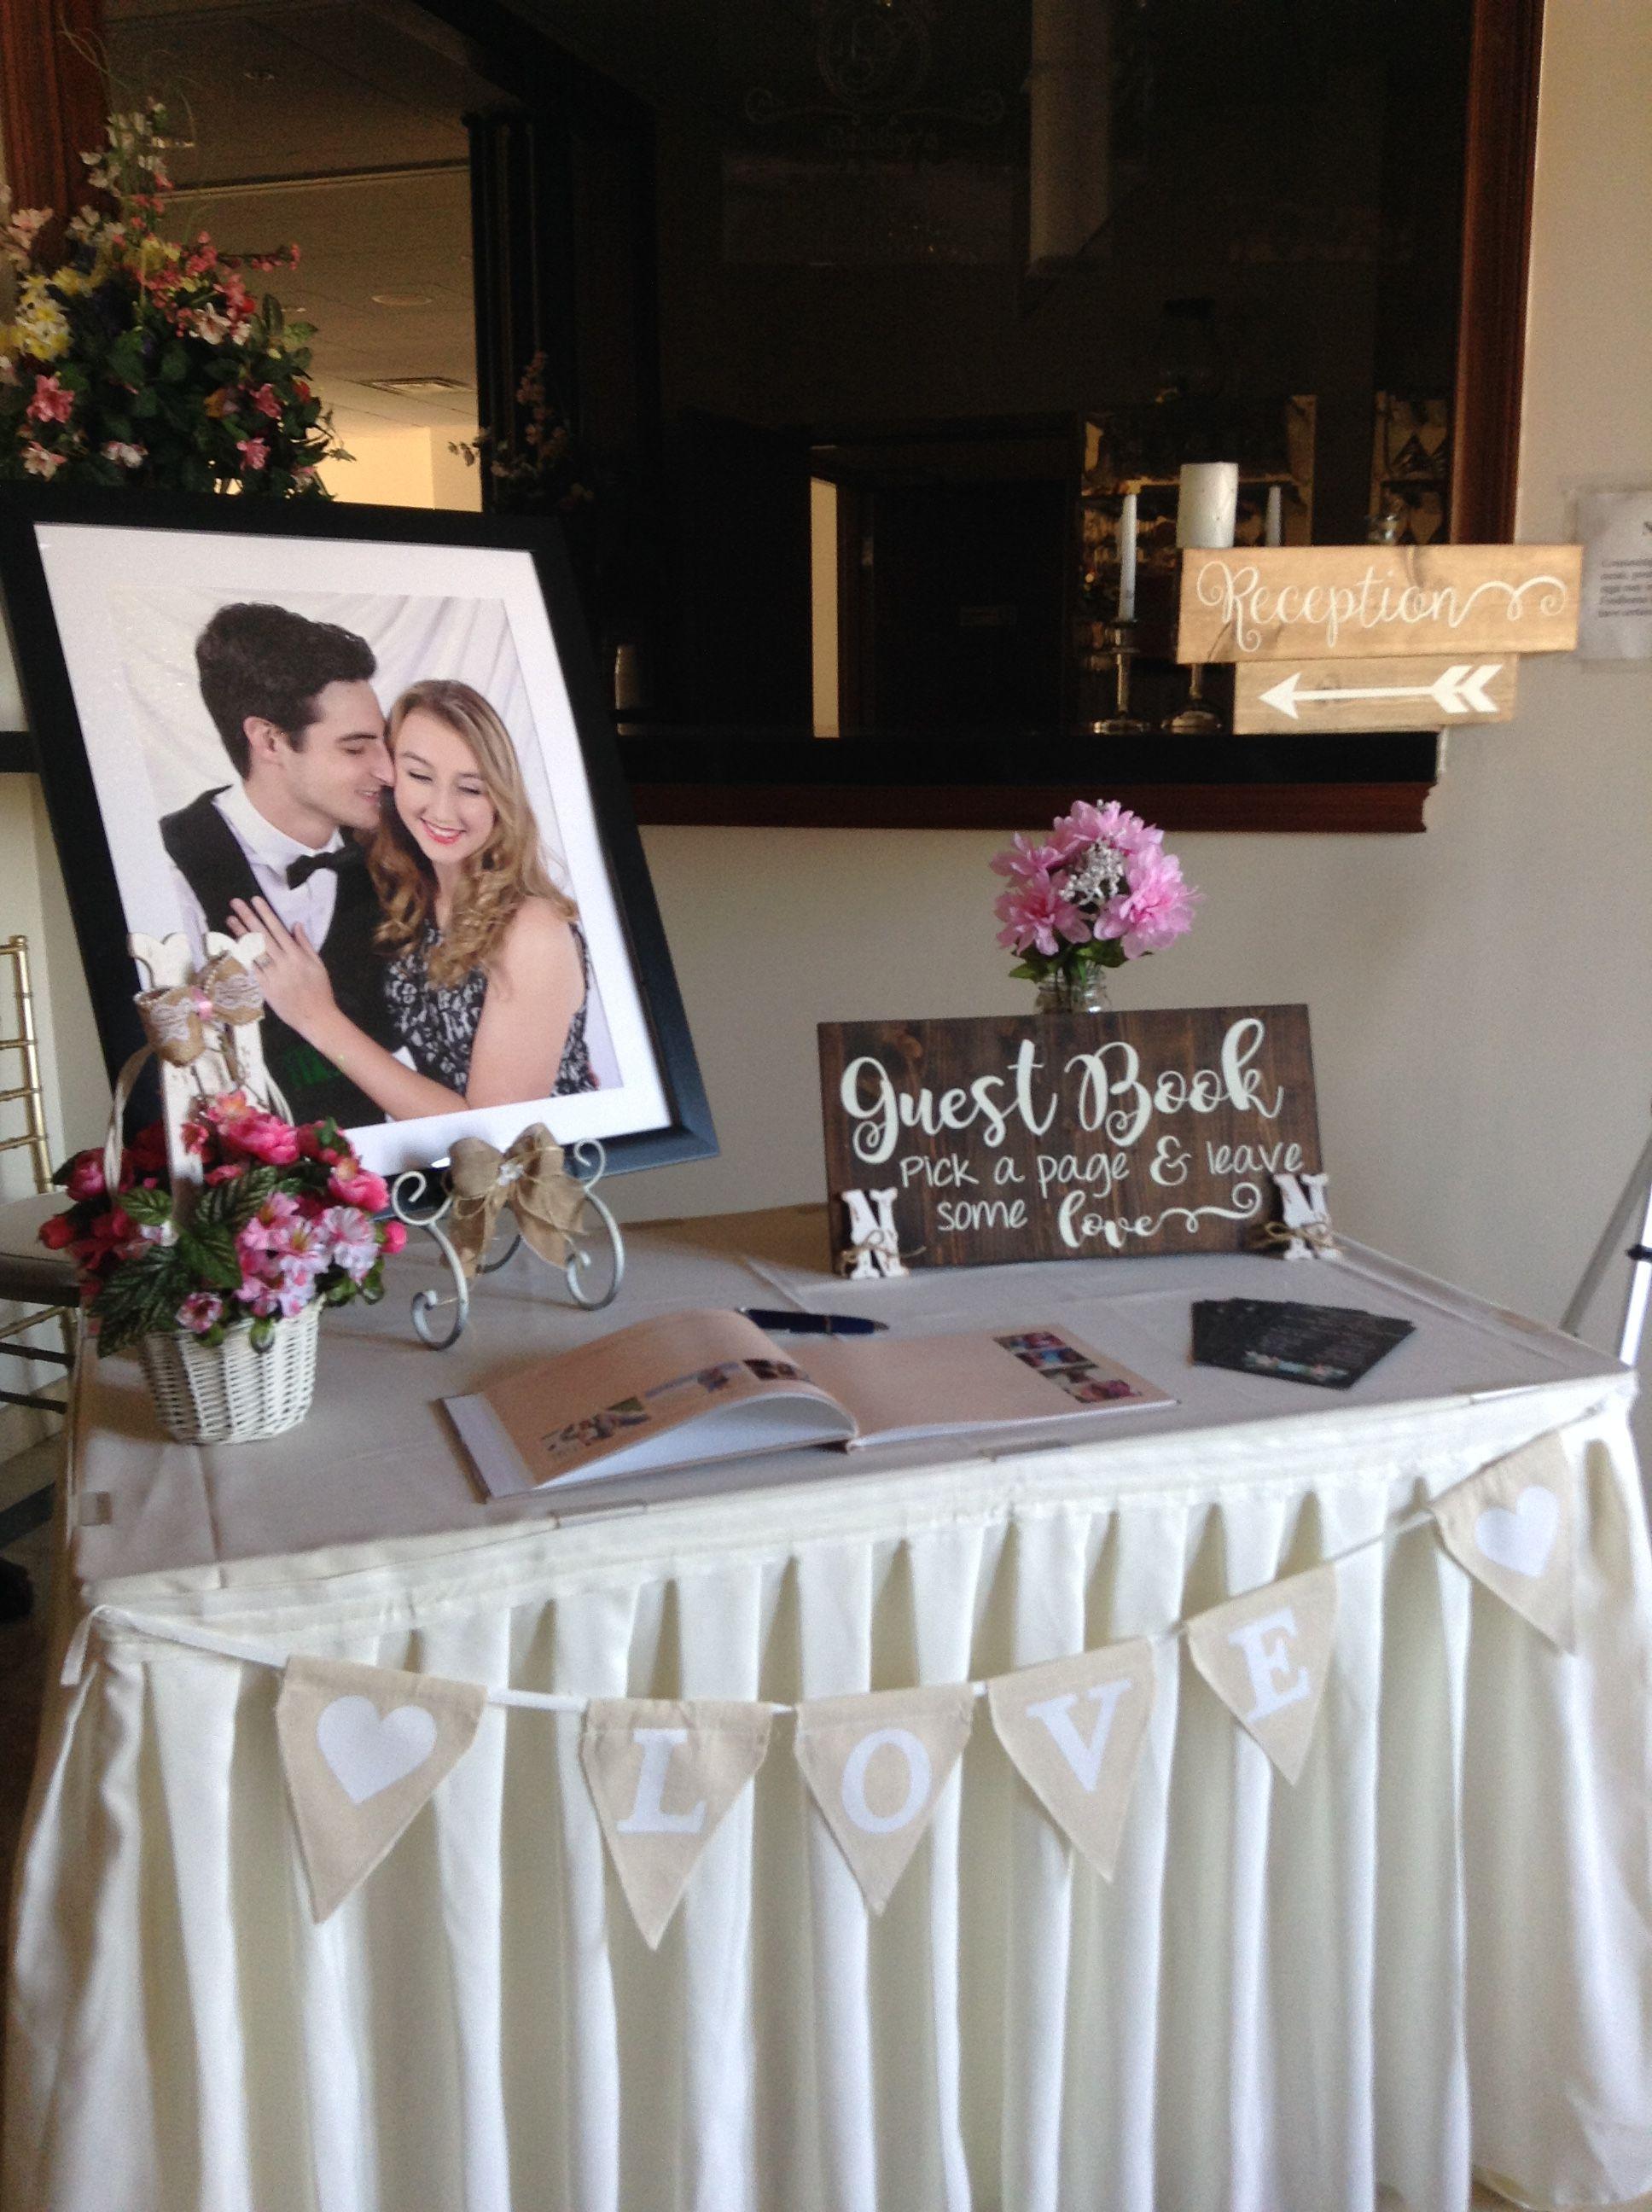 Die Phot Frame Kunnen We Ook Zetten Wedding Welcome Table Wedding Entrance Table Card Table Wedding